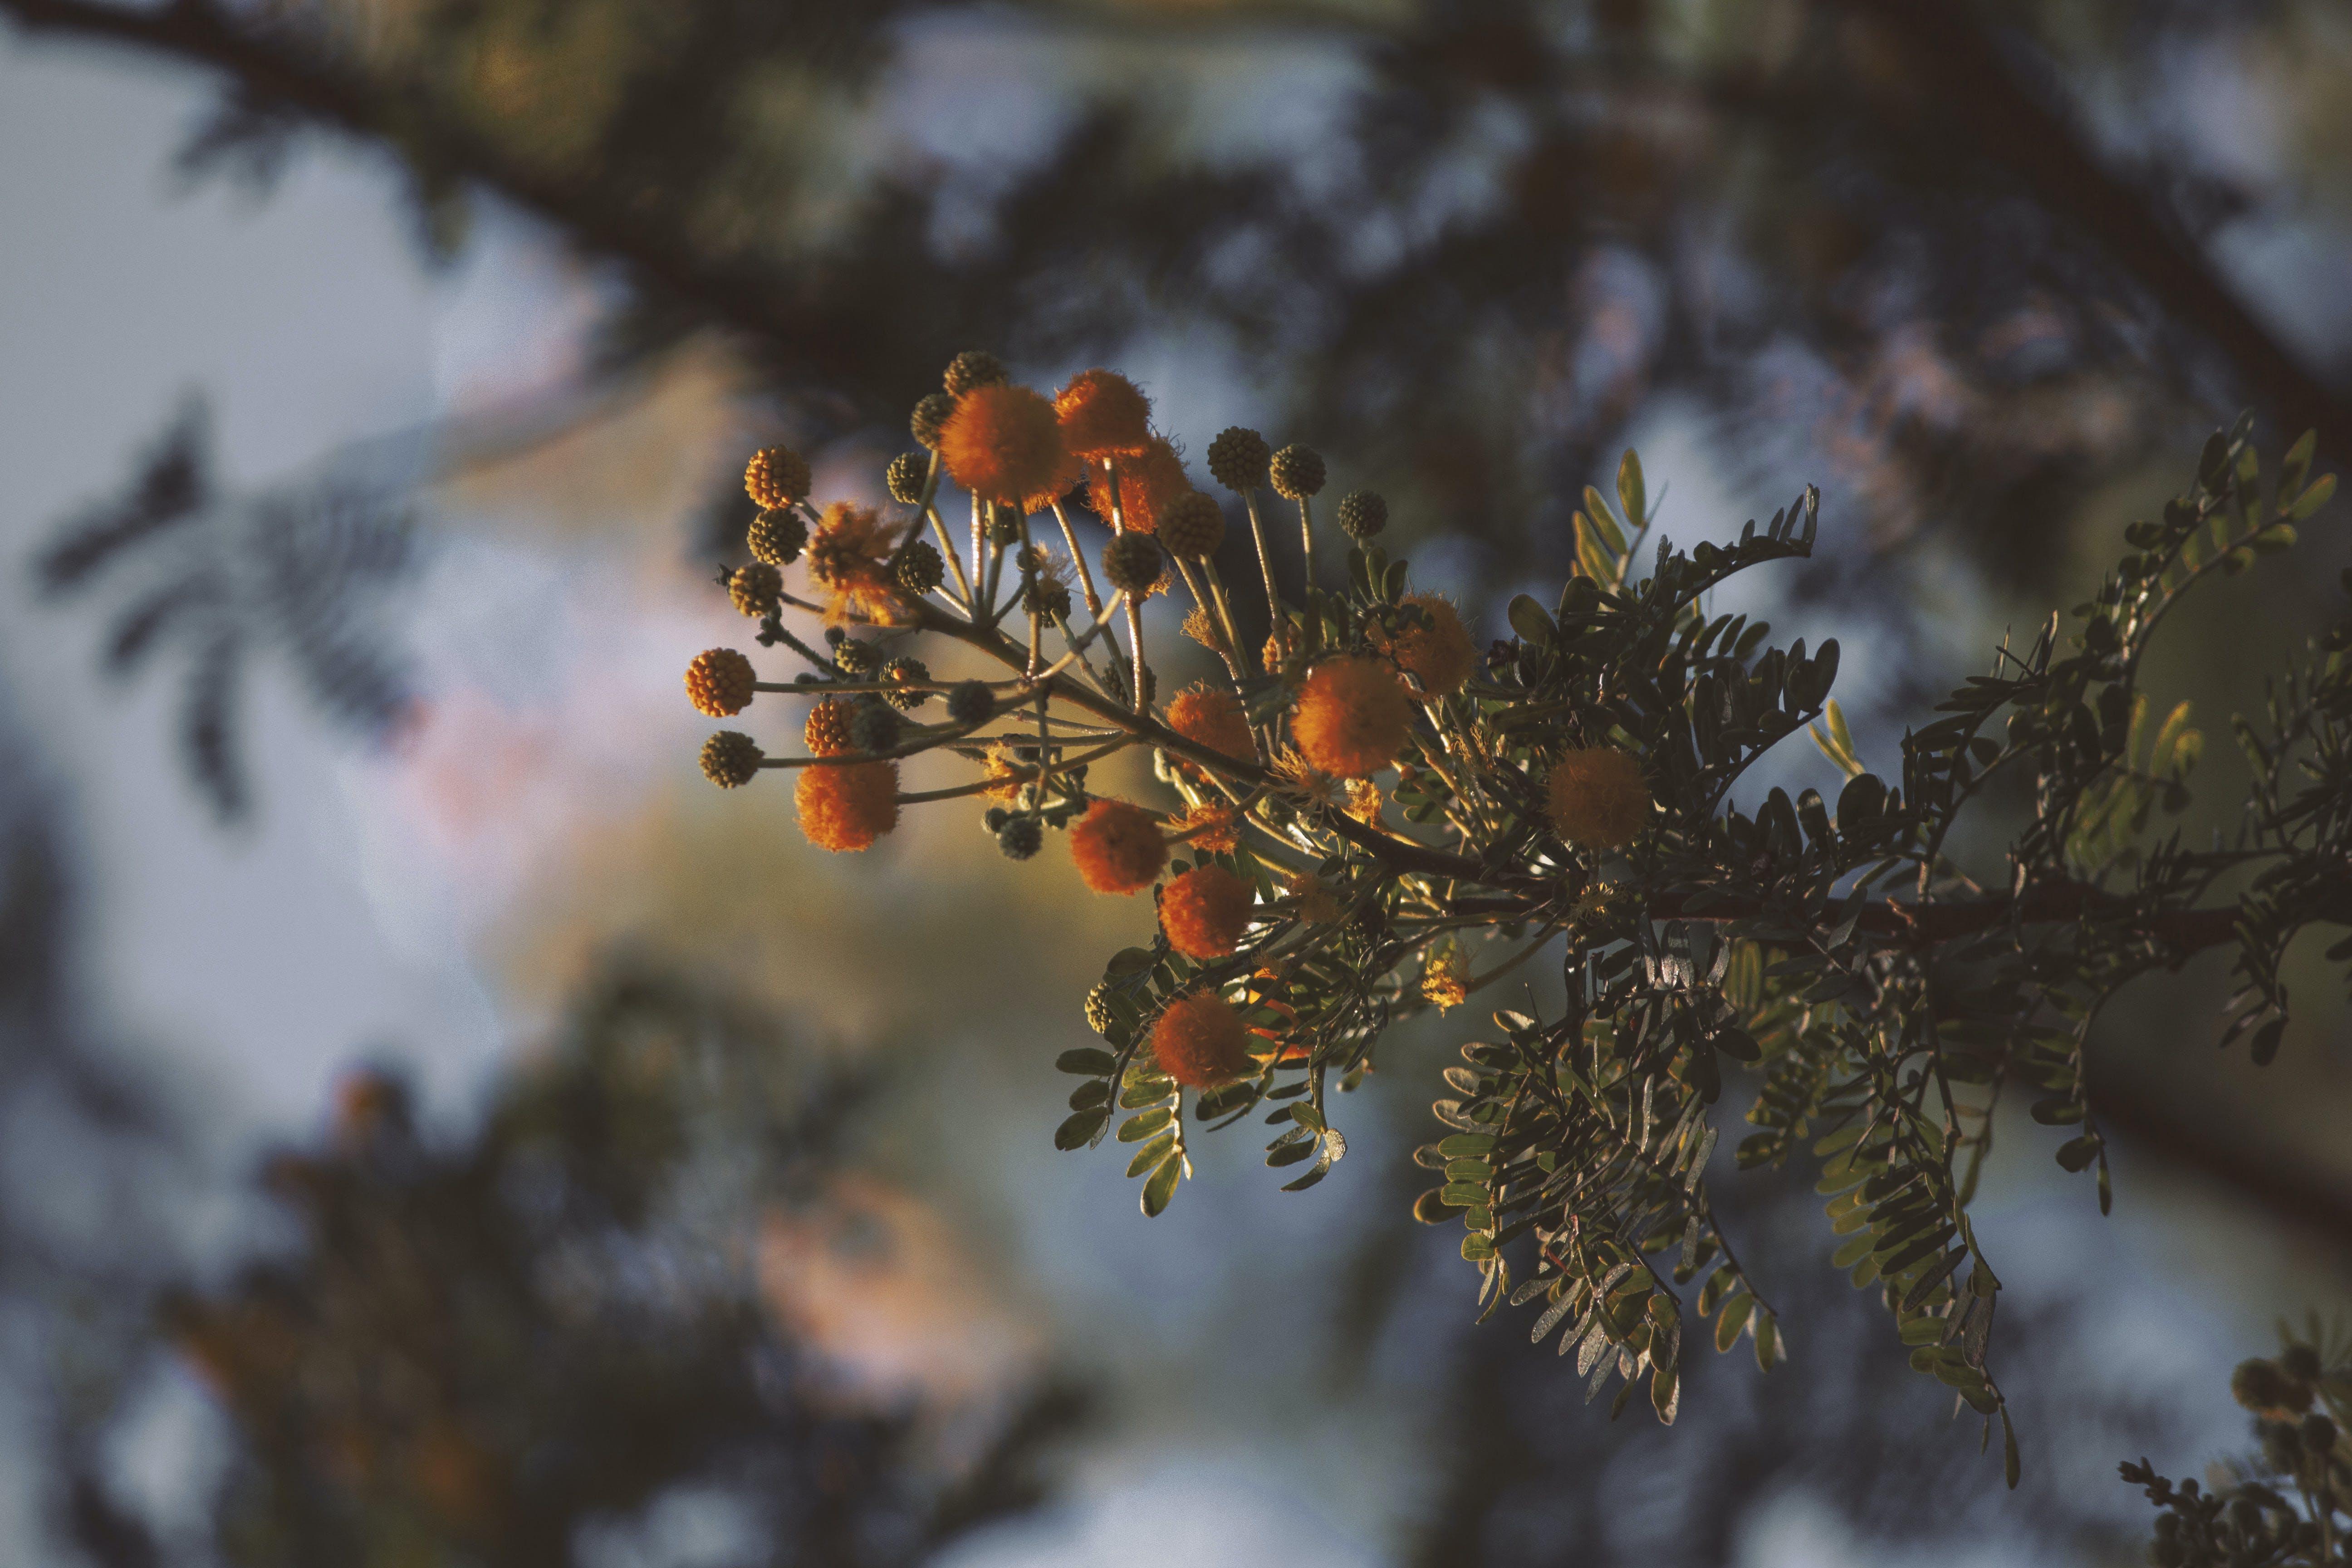 Selective Focus Photography of Round Orange Plant